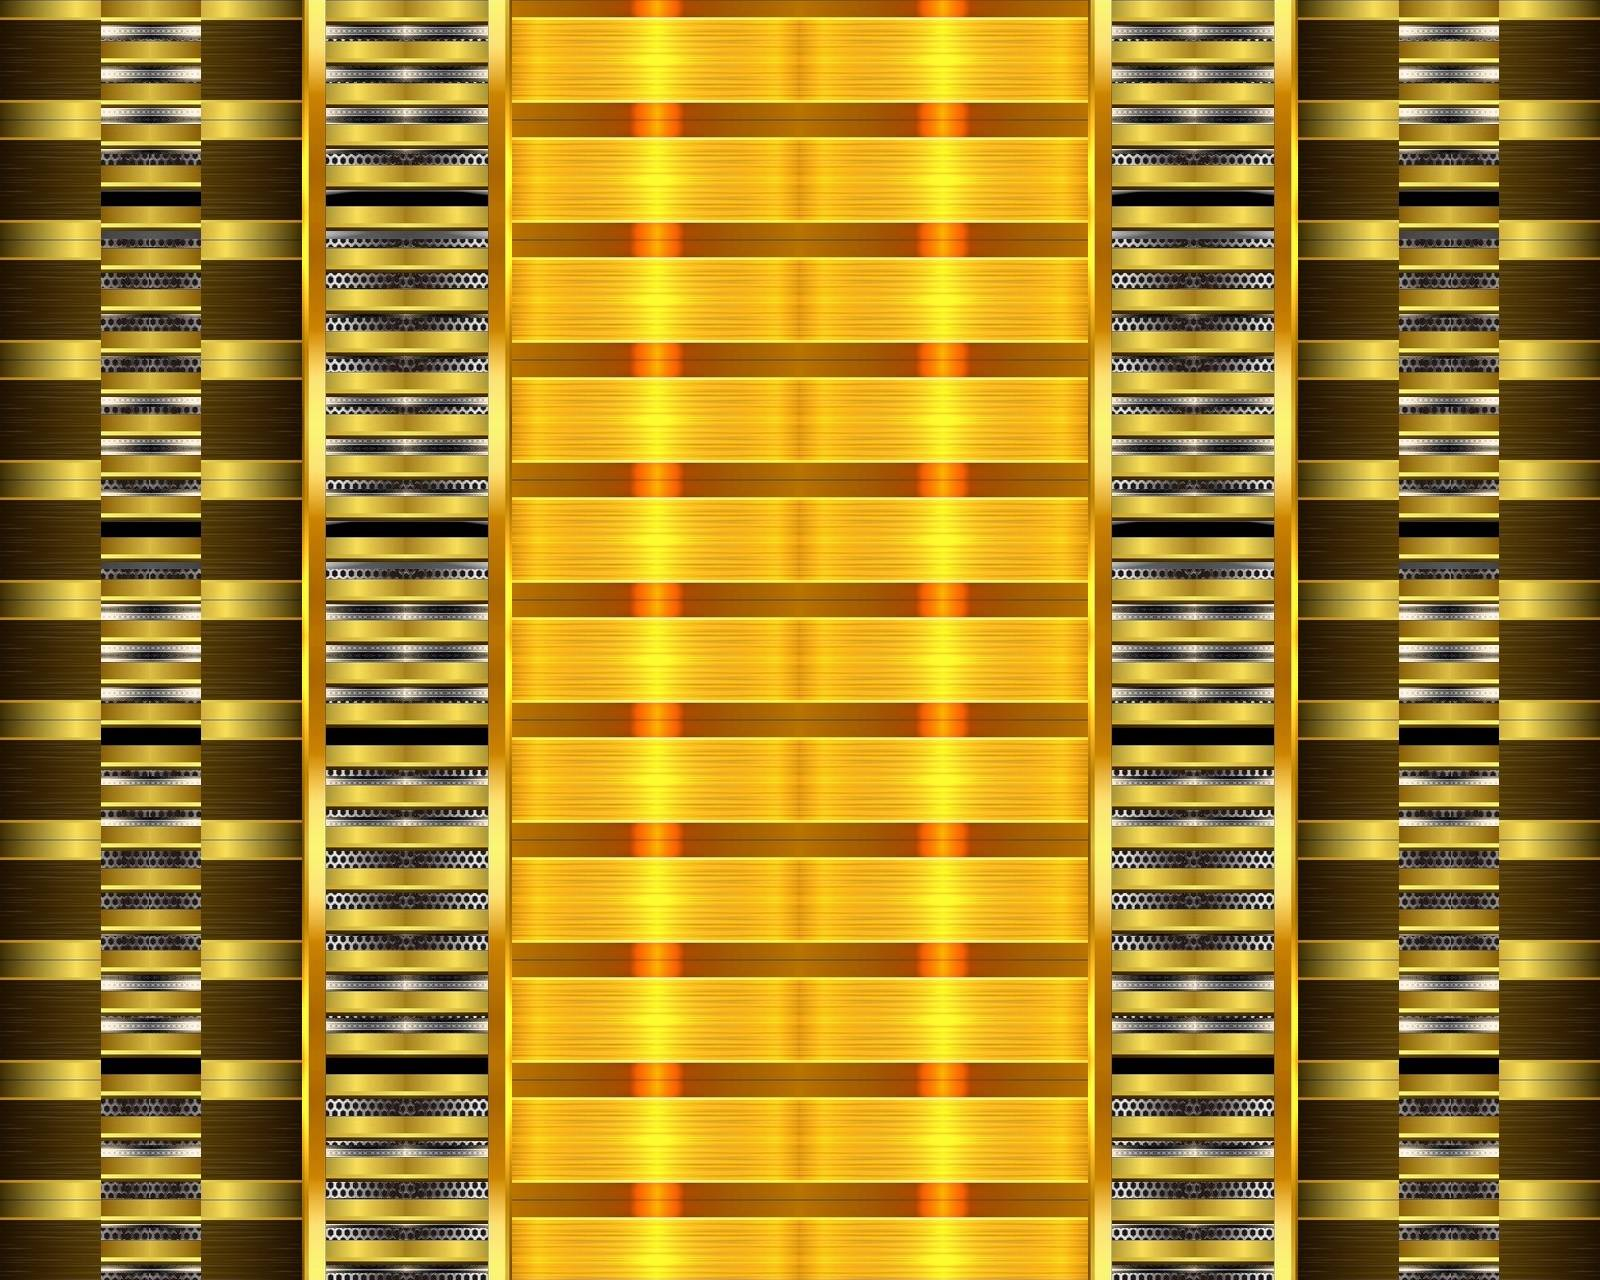 Golden Entry